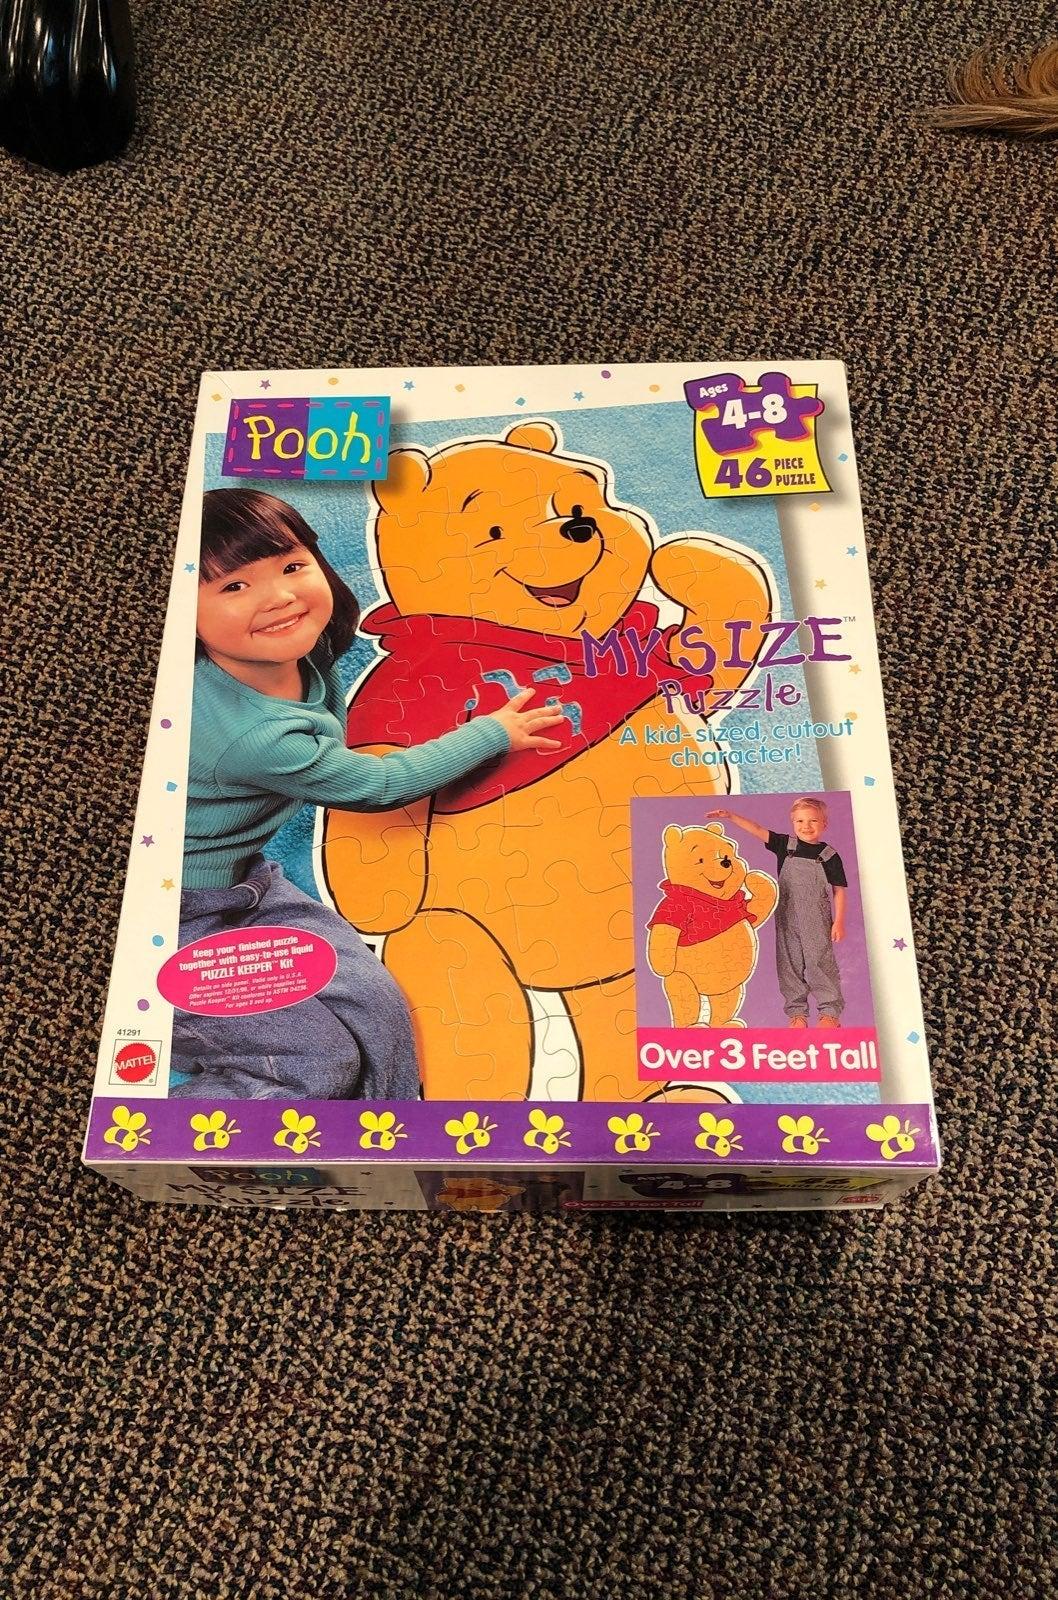 Mattel Pooh My Size Puzzle. 46 Pieces.